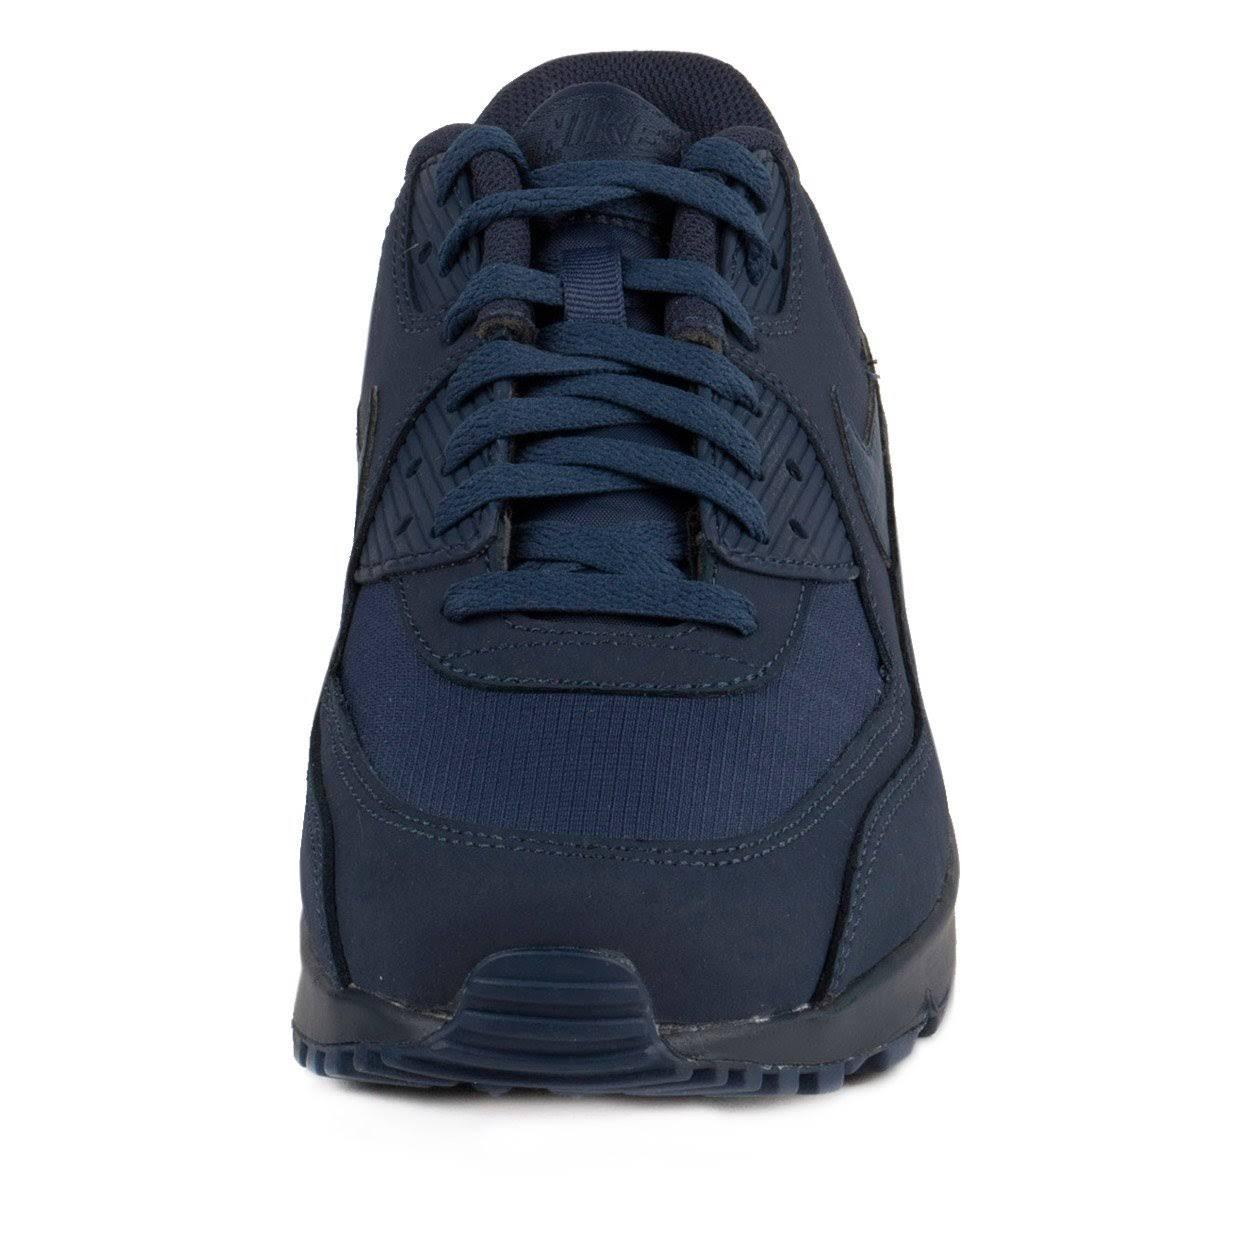 Sz Nike Navy Hombres Max Air Midnight 412 9 537384 90 Essential Medianoche q44vBFwW